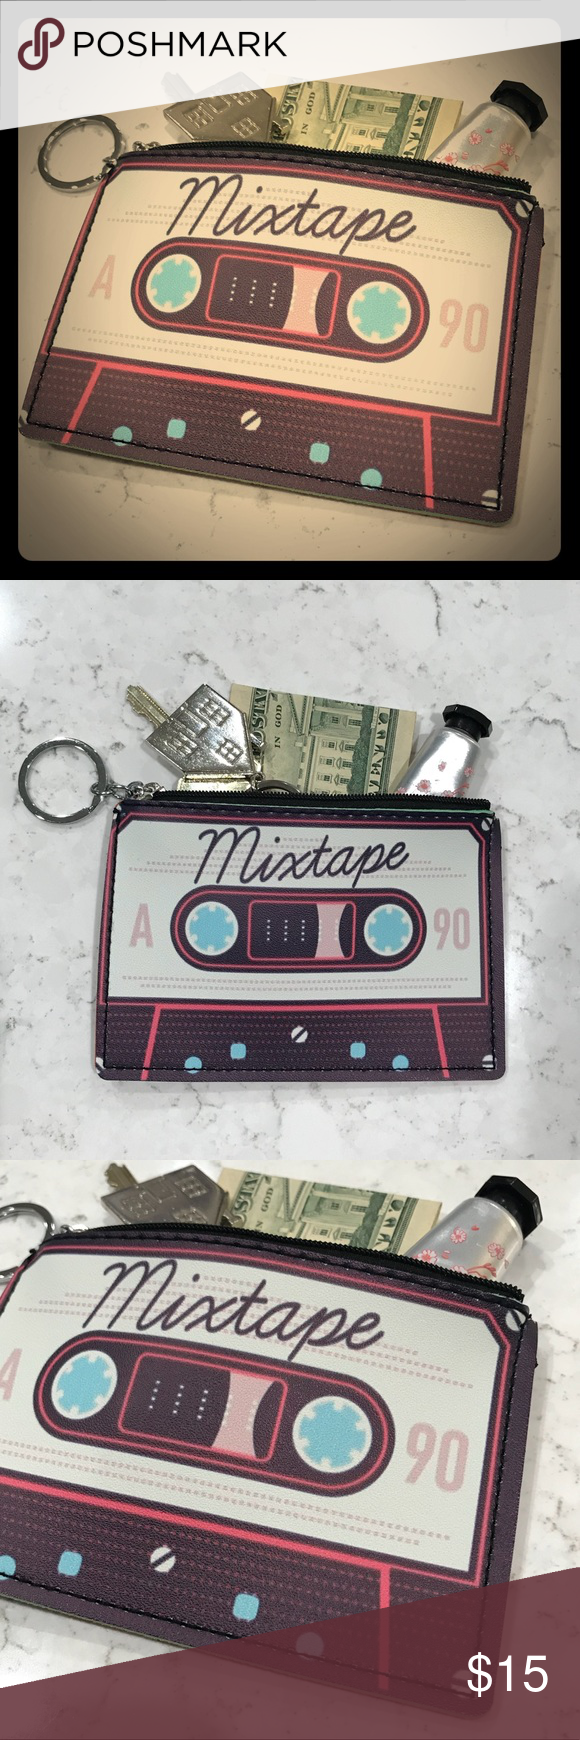 Mix cassette tape coin purse A fun little coin purse! Fits